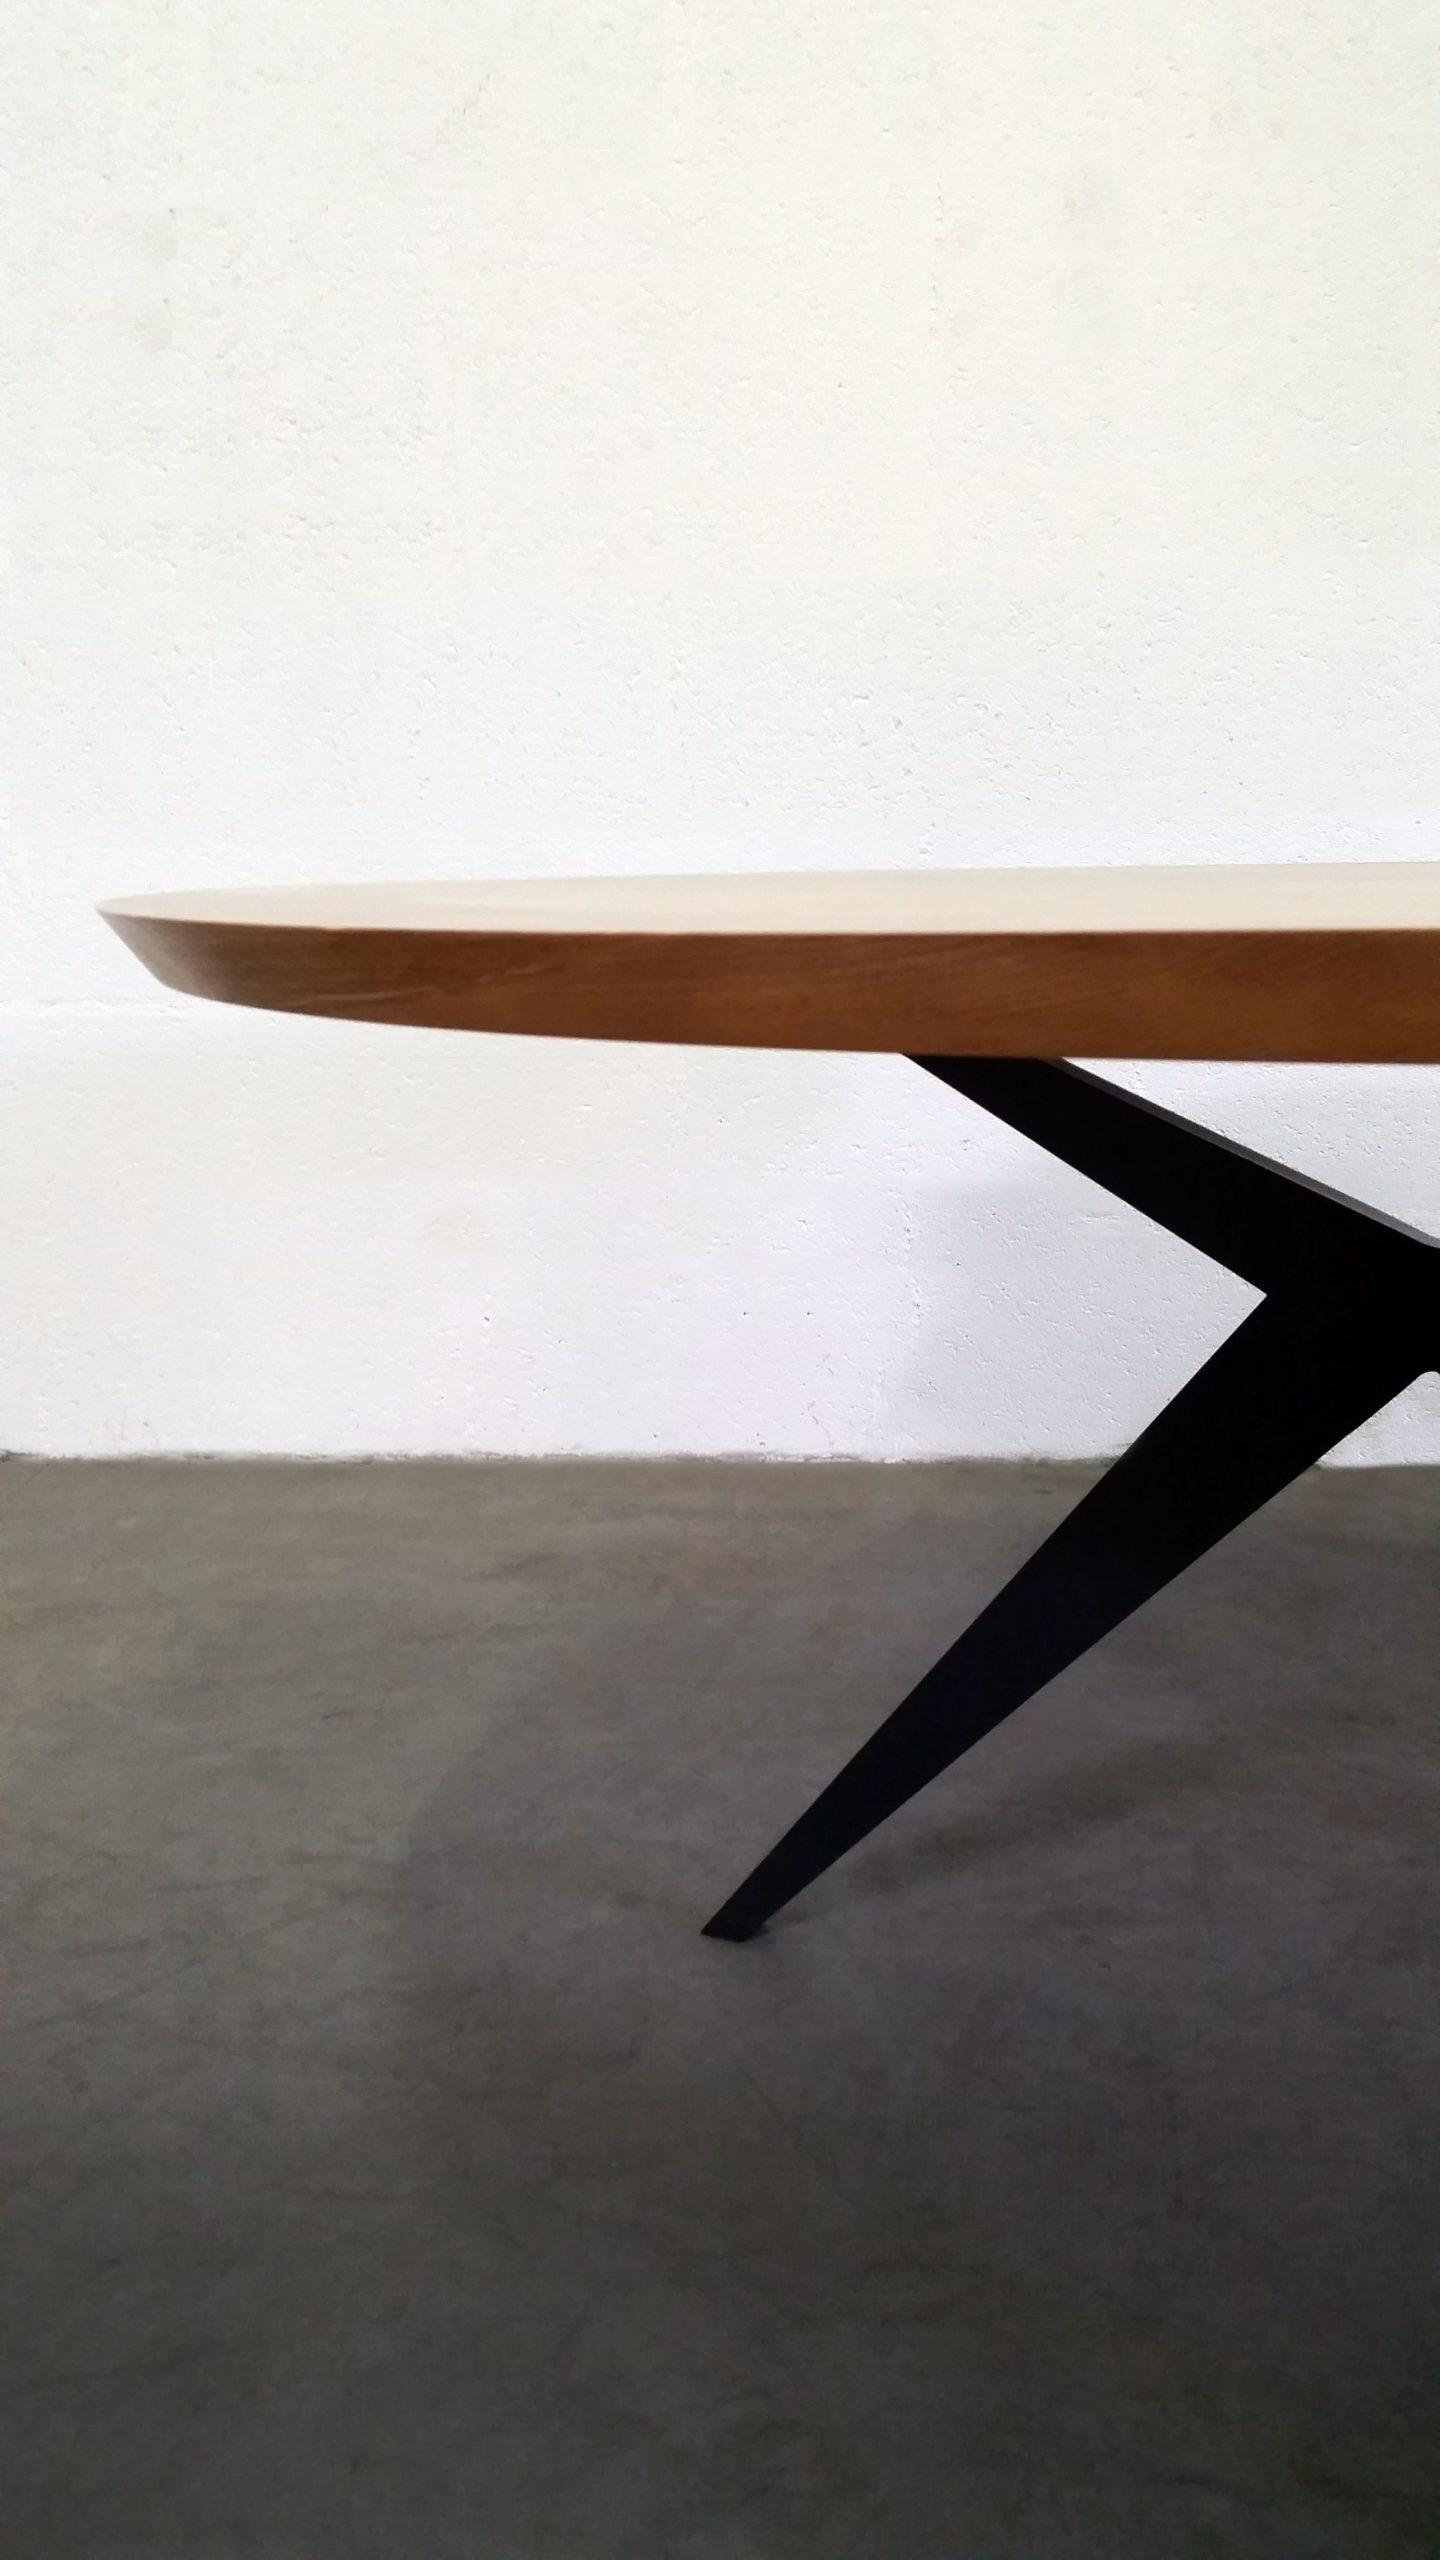 ARTMETA / table papillon ronde diamètre 140 cm / frêne olivier et pied RAL 7016